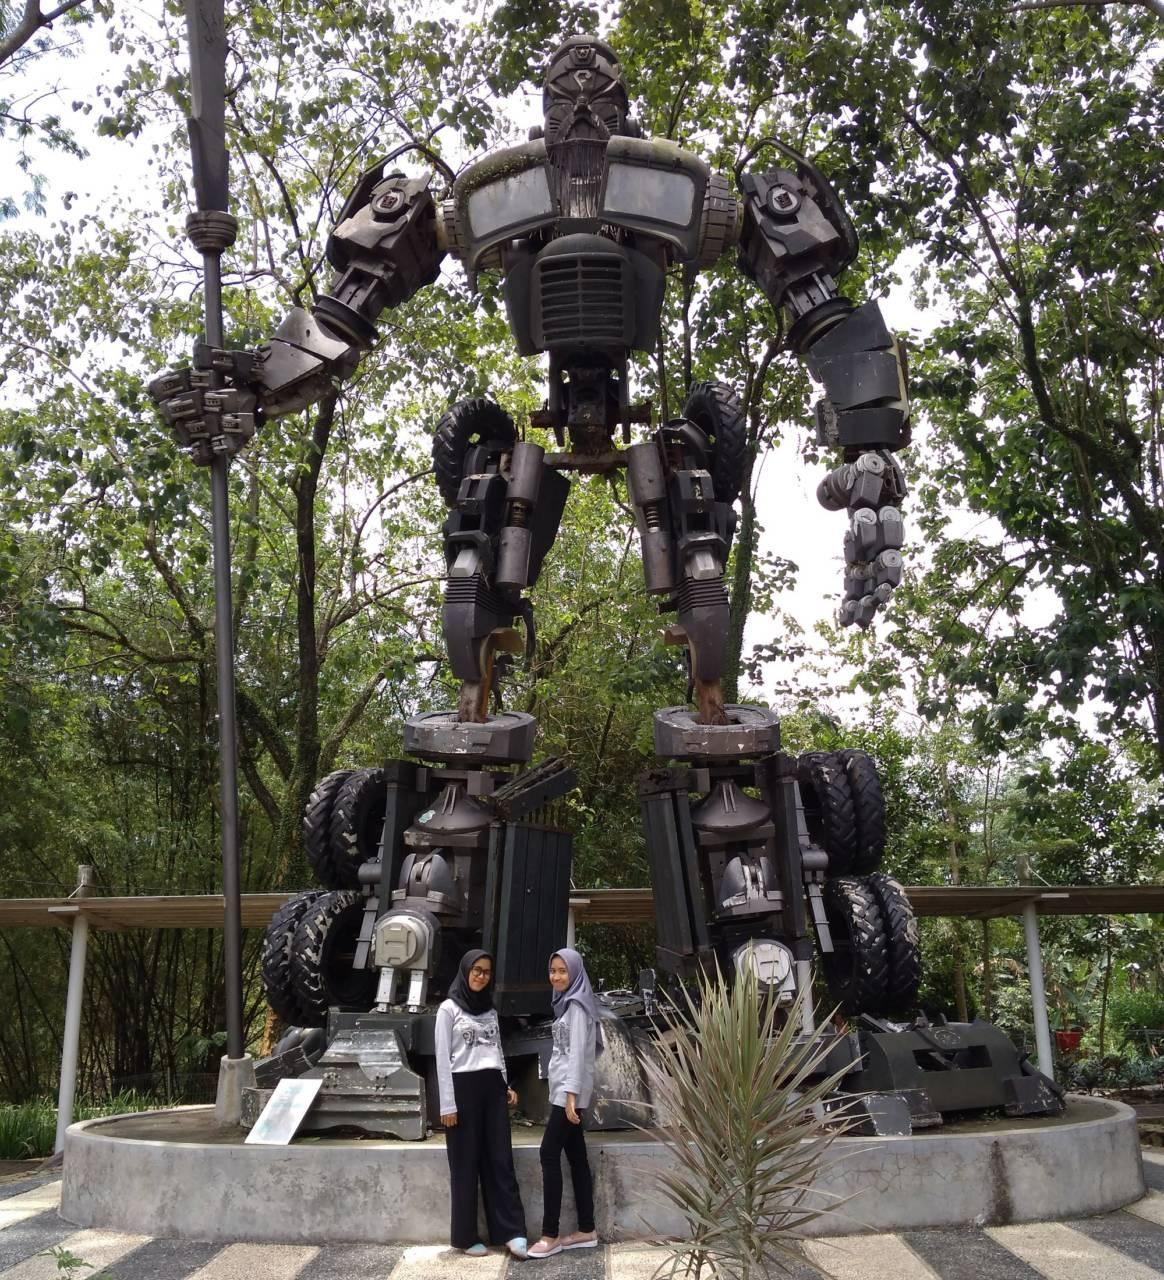 patung robot dari bahan bekas